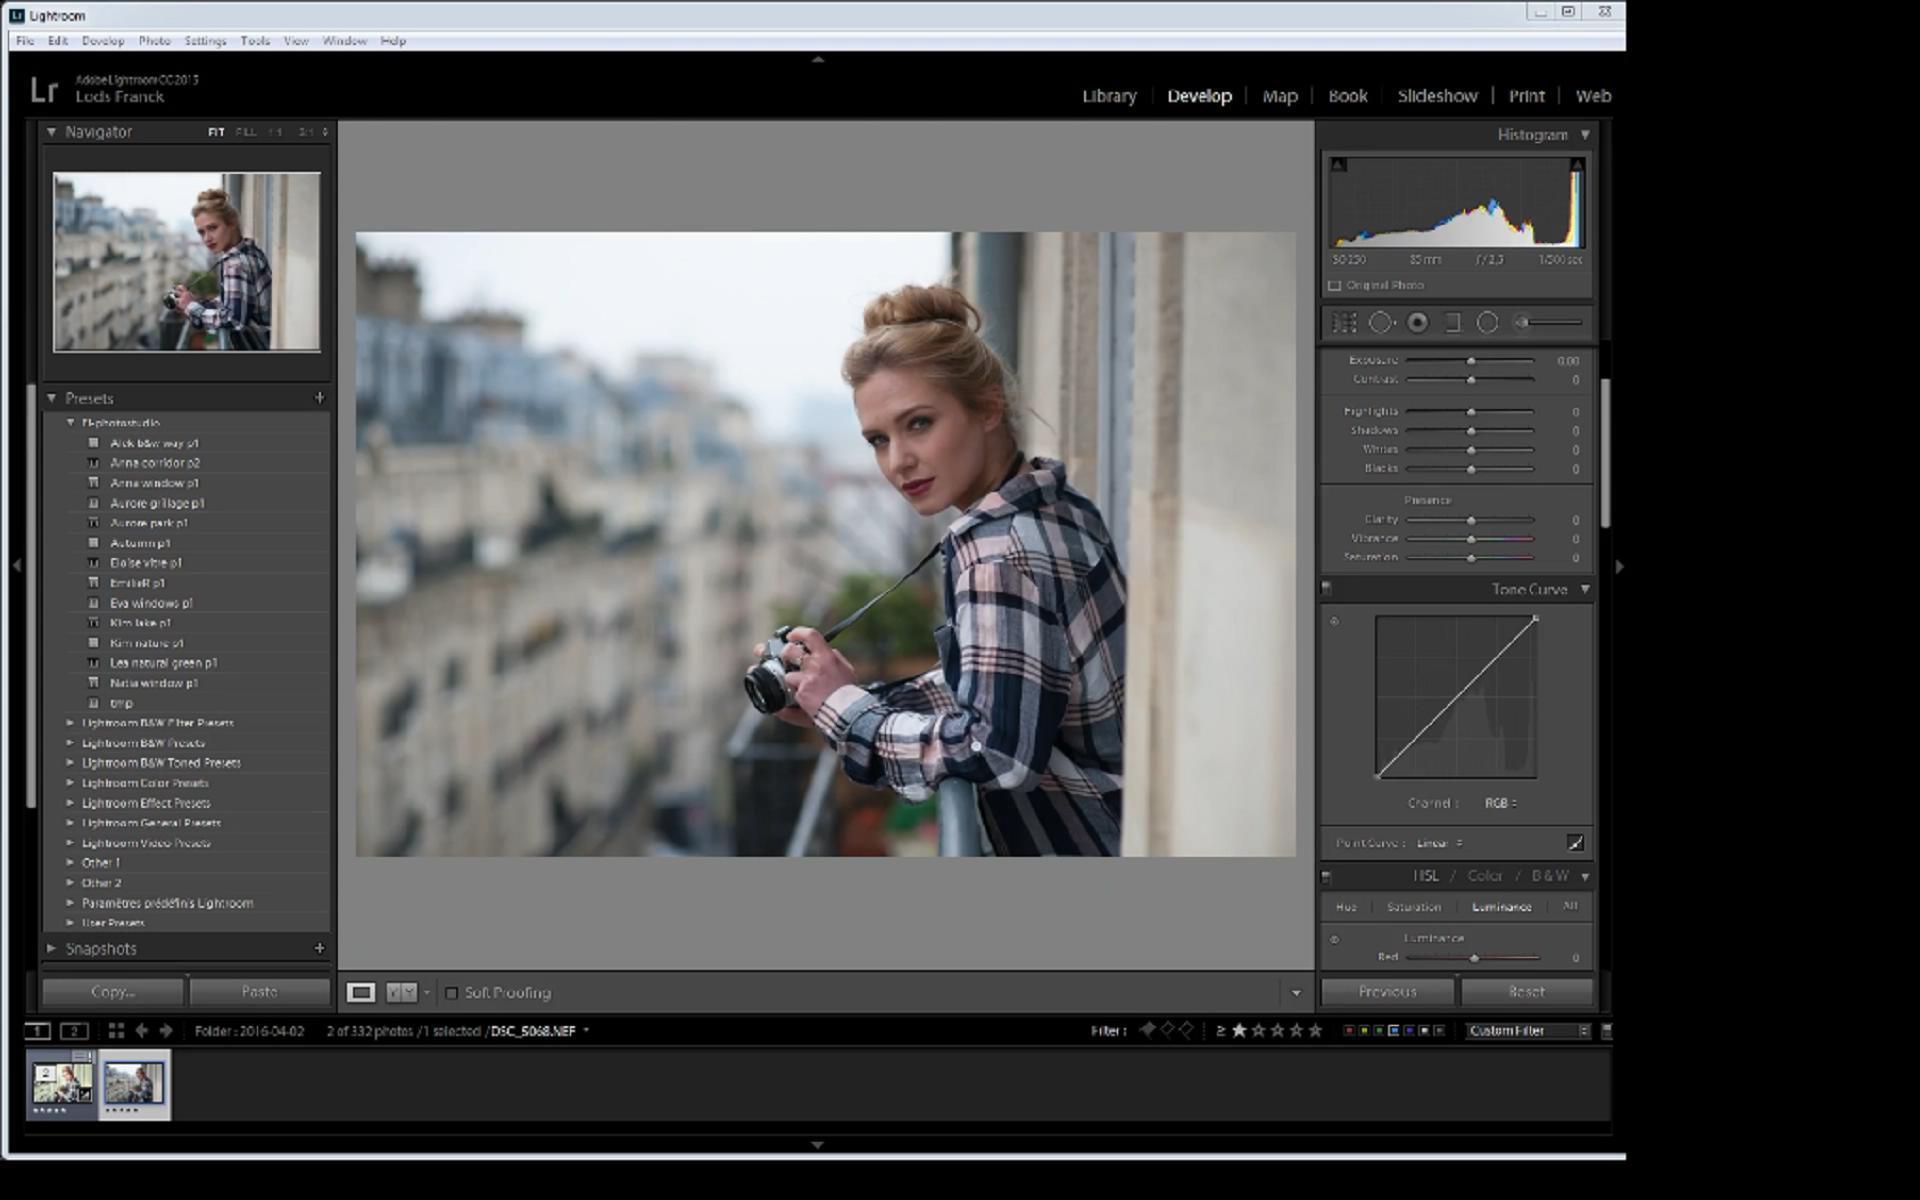 【S370】摄影师 Lods Franck 复古风格人像修饰教程Lods Franck Portrait Retouching: Eva